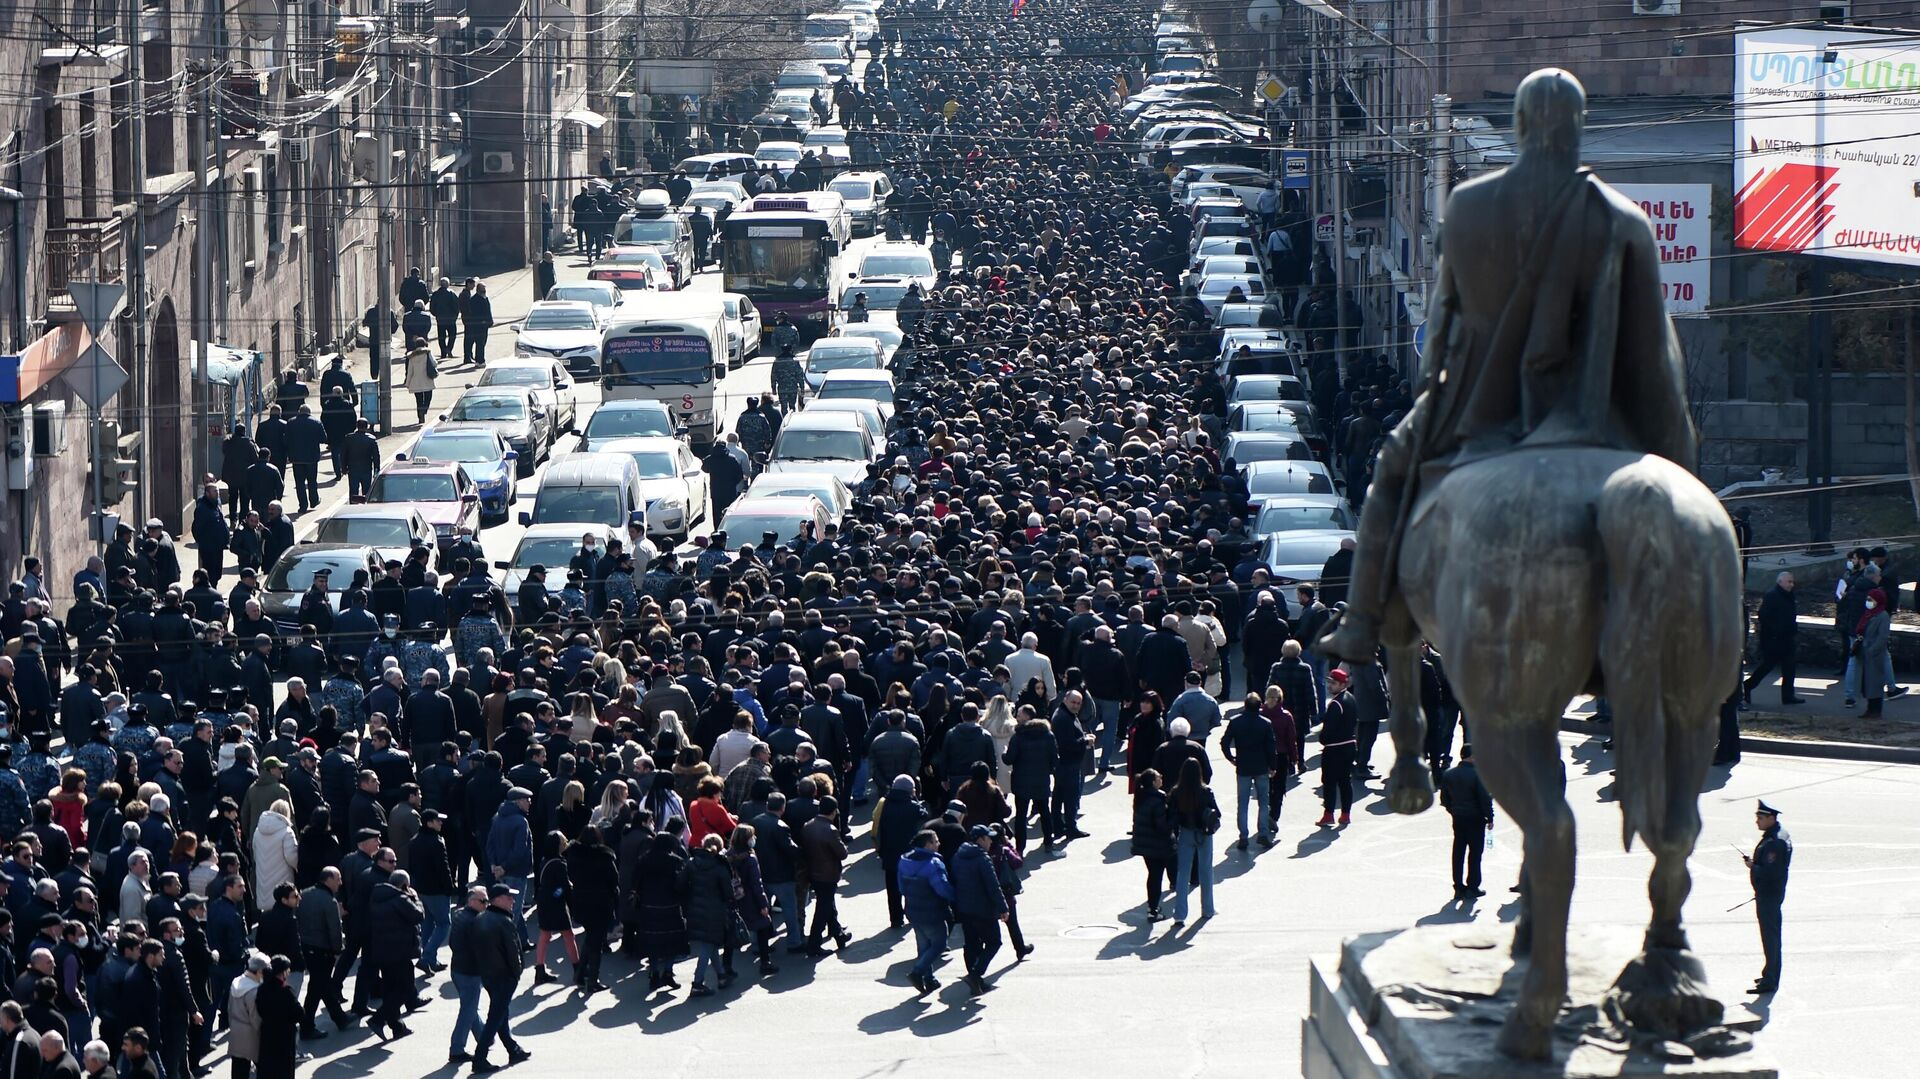 Митинг оппозиции в Ереване  - РИА Новости, 1920, 27.02.2021